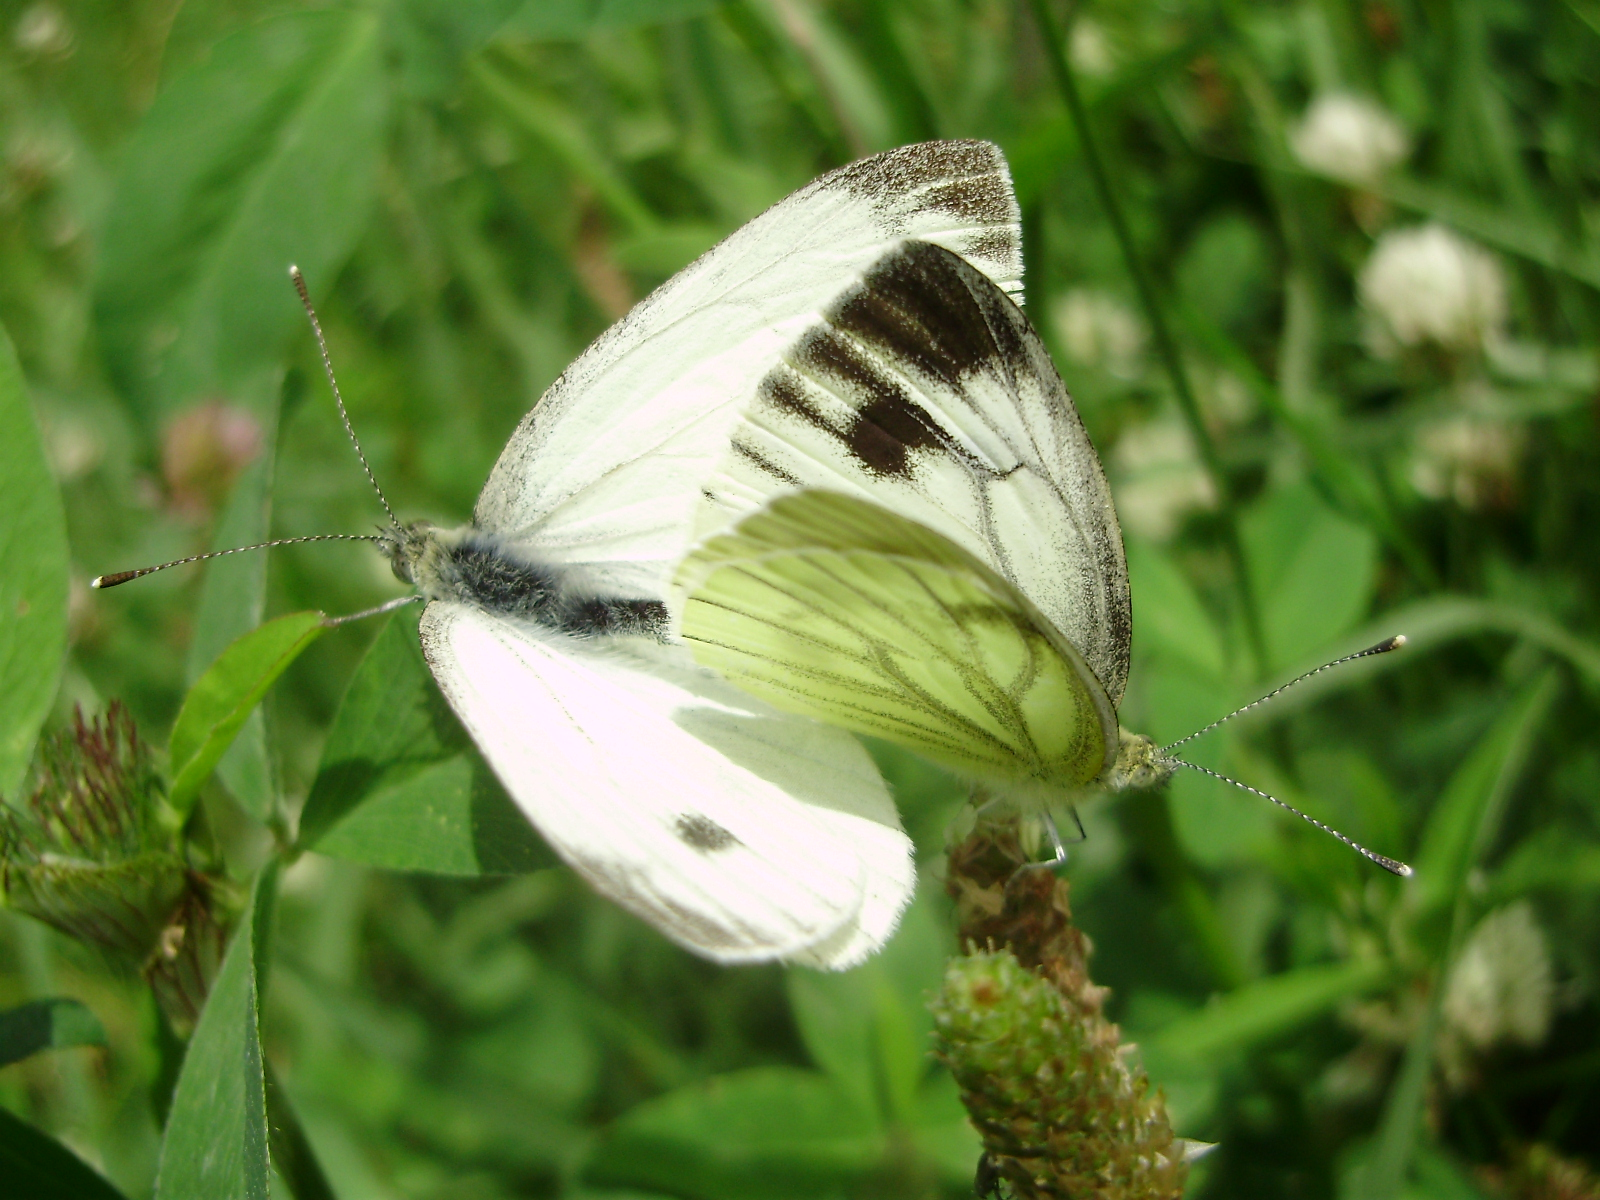 Pareja de mariposas Pieris napi en copula